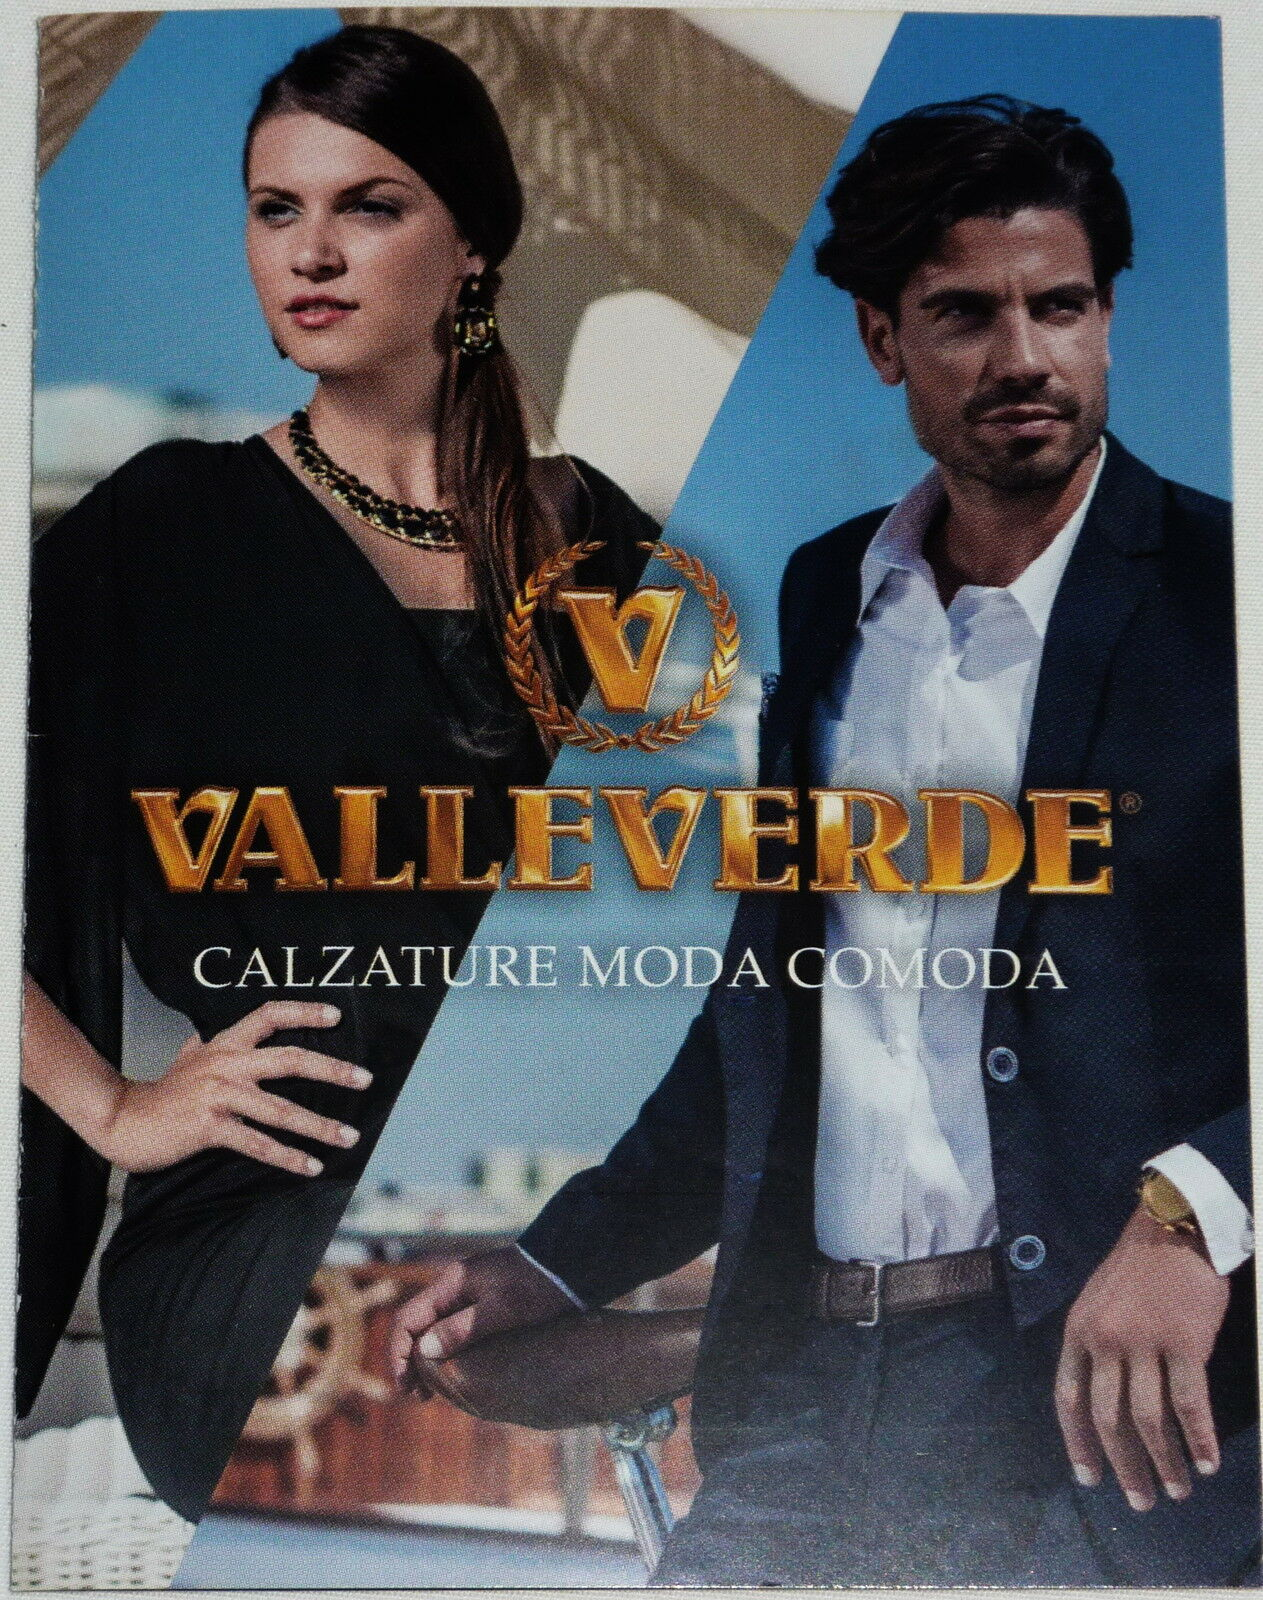 11811 VALLEverde SCARPE MOCASSINI UOMO PELLE NABTORTORA FONDO GOMMA GOMMA GOMMA n. 42 3acff5